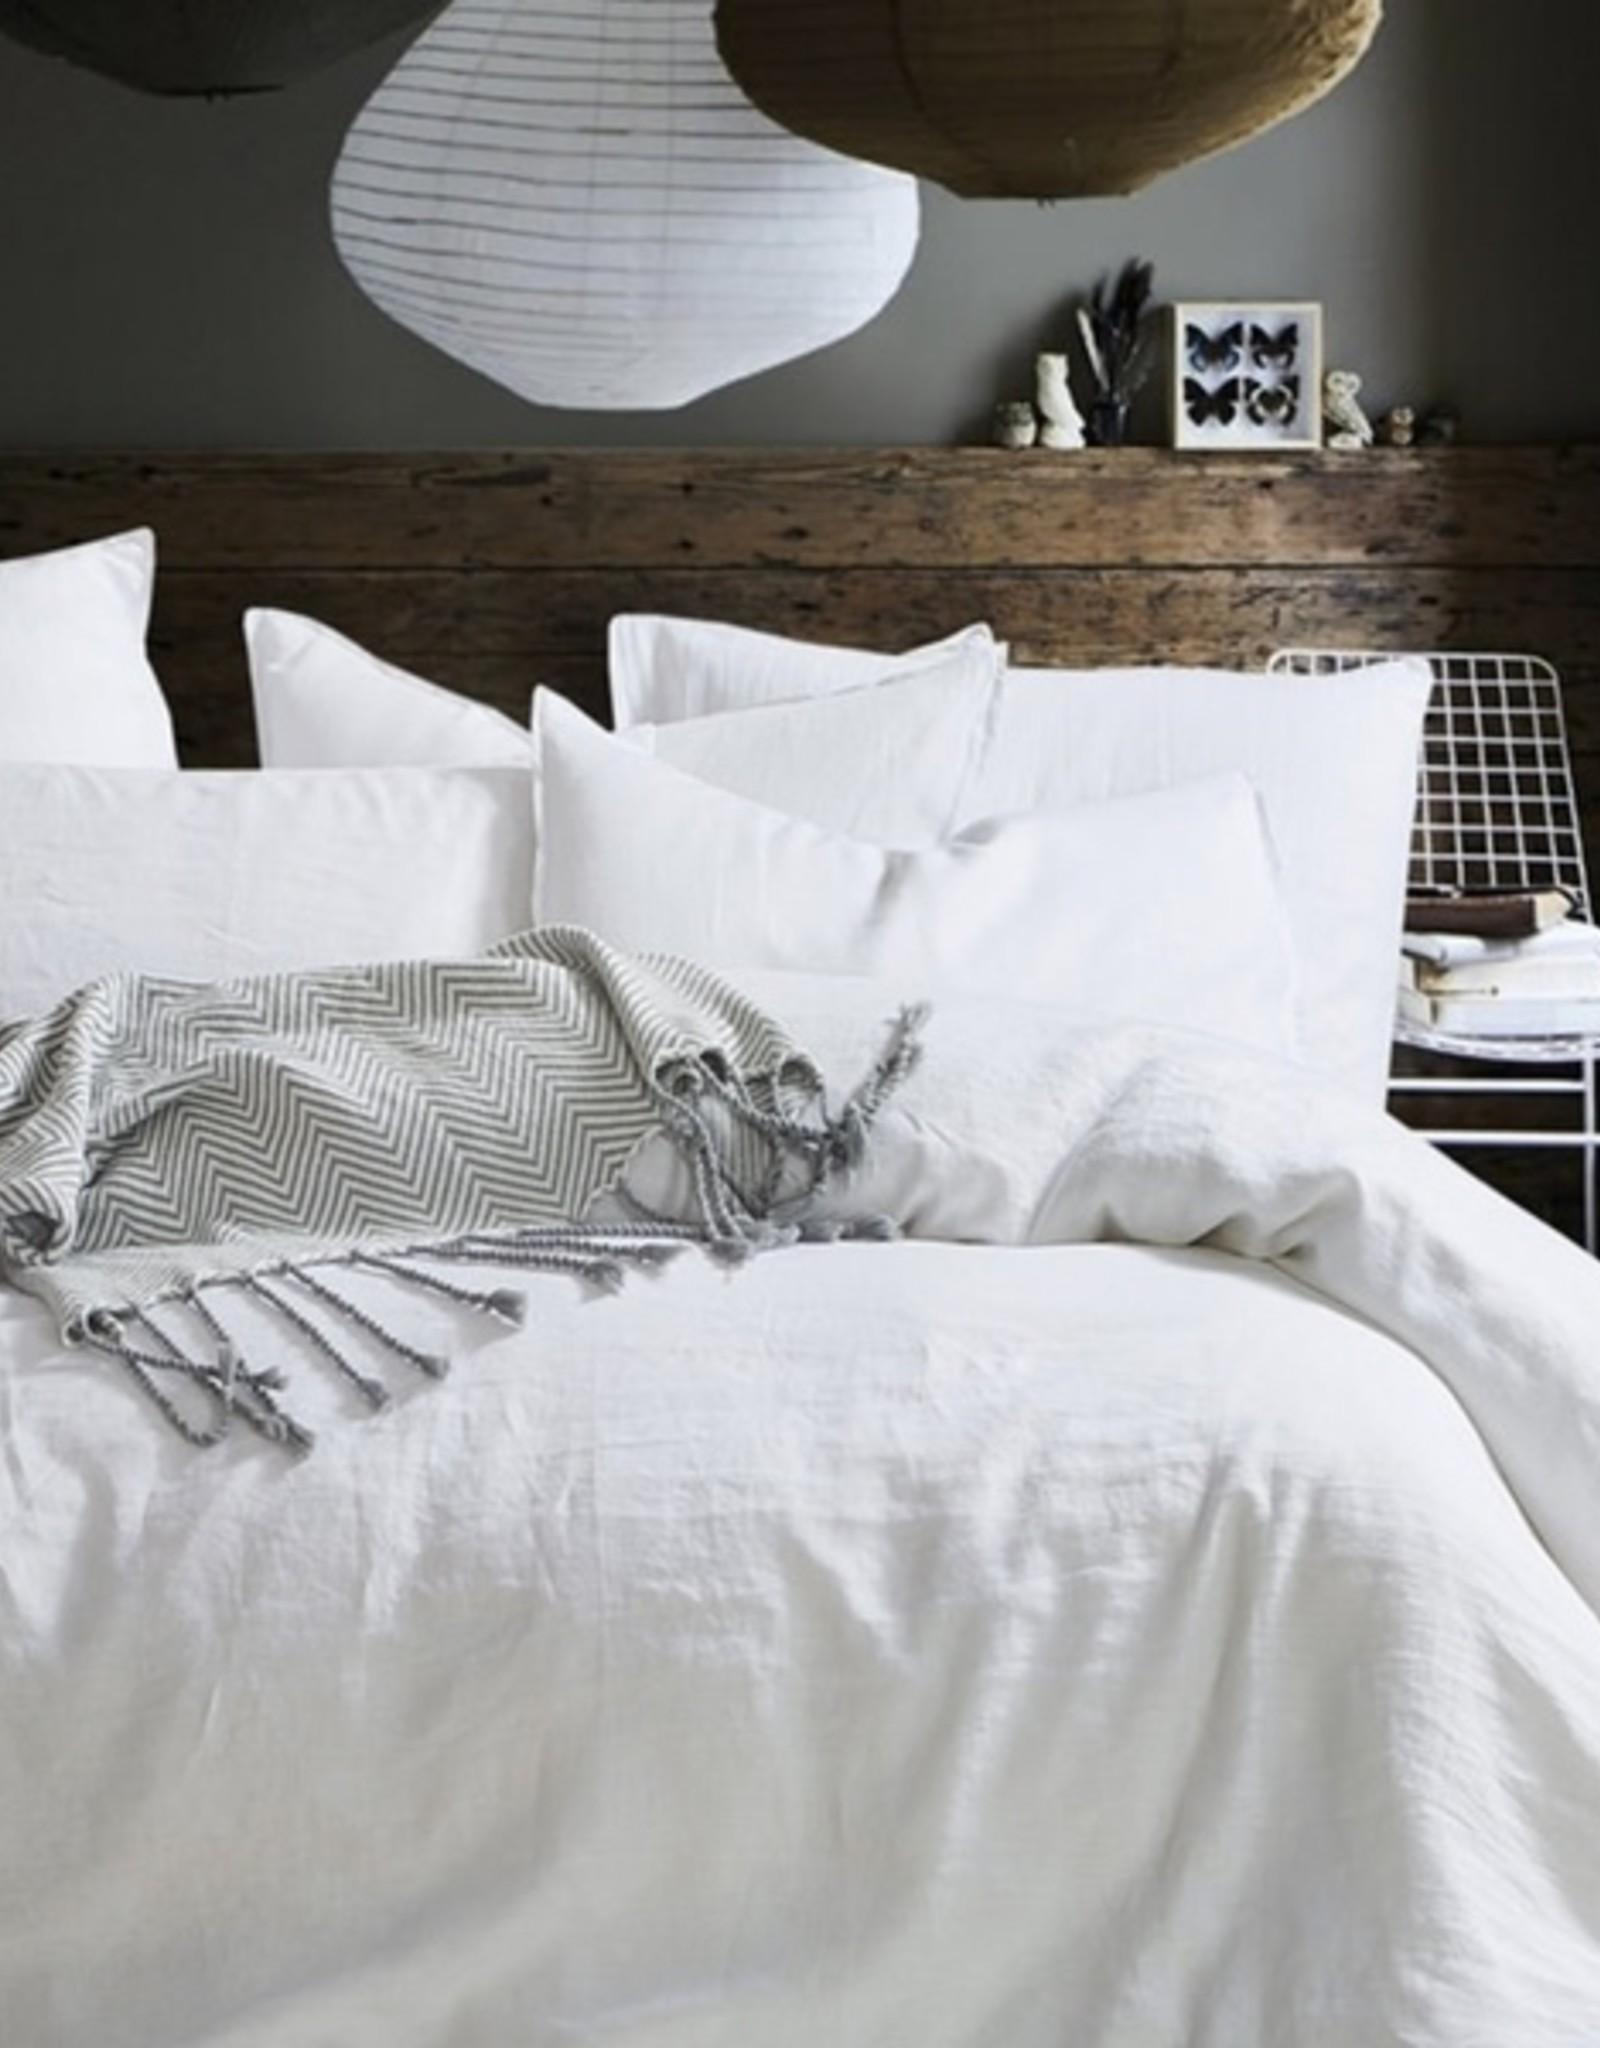 Daniadown Duvet Set Daniadown Star White Linen King w / Pillow Cases